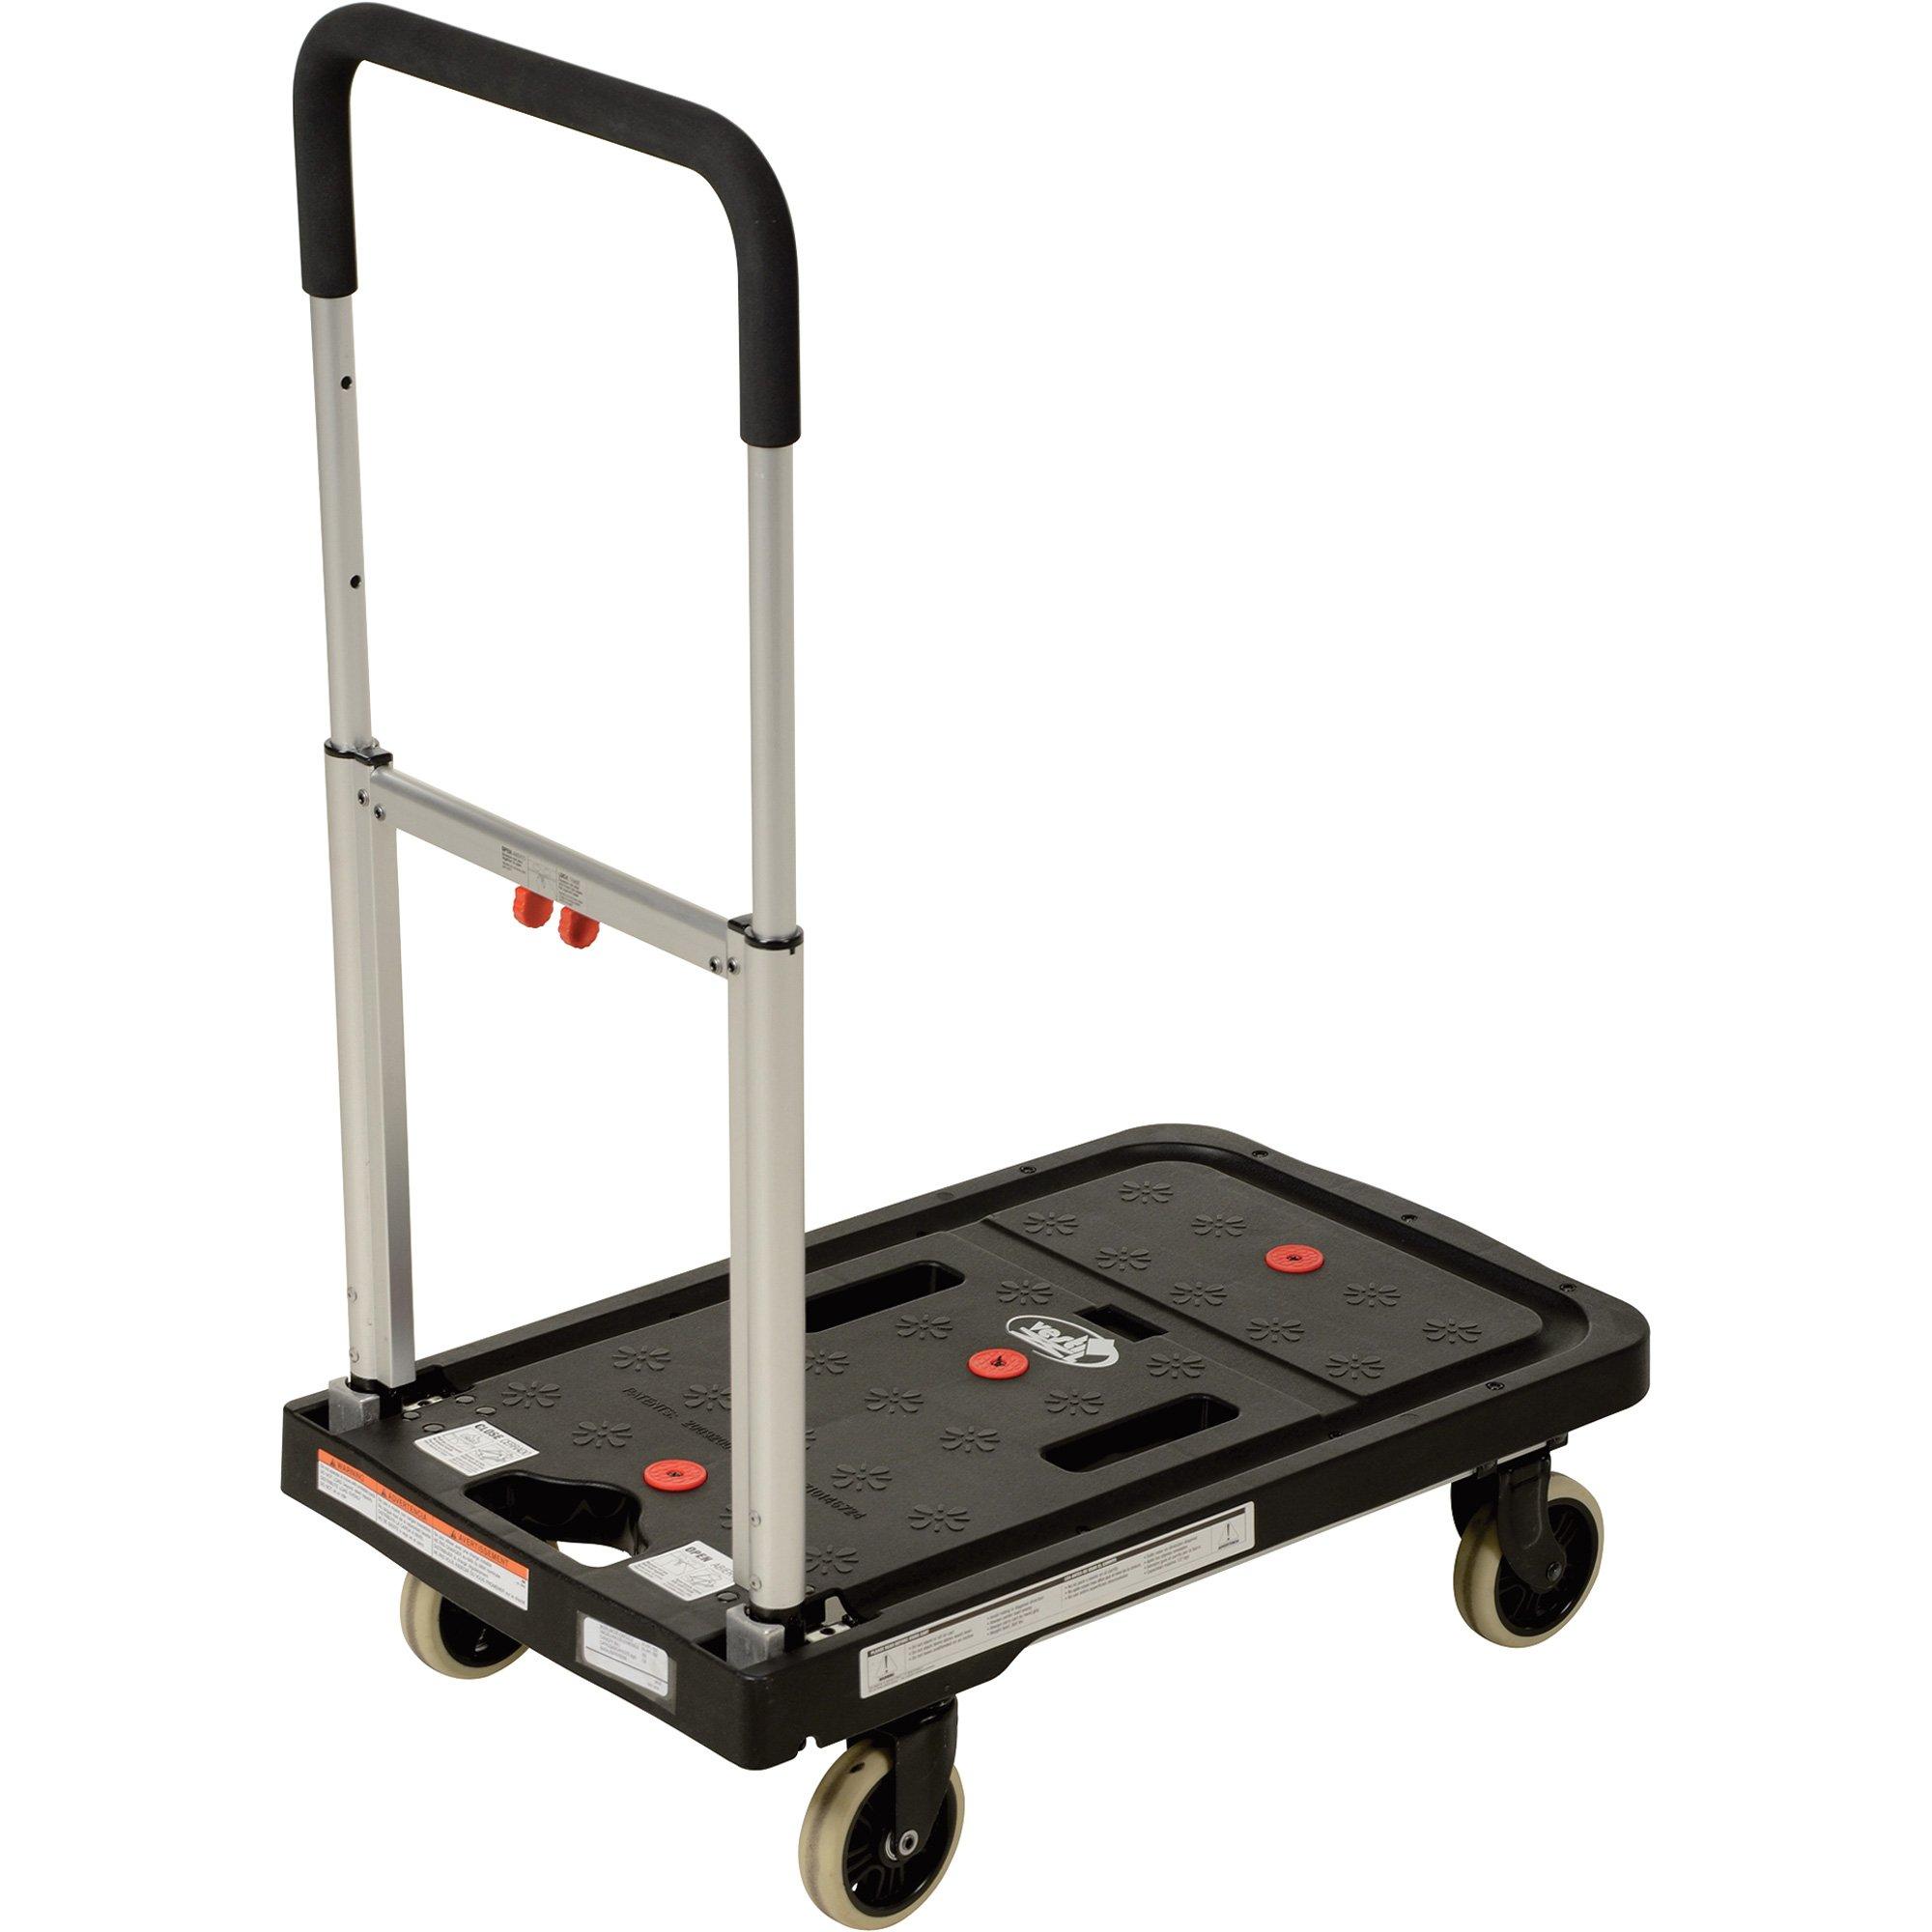 Vestil FF-FPT-1627 Fold Flat Plastic Cart, 26.75'' Length, 16.25'' Width, 36.5'' Height, 300 lb., Black by Vestil (Image #3)